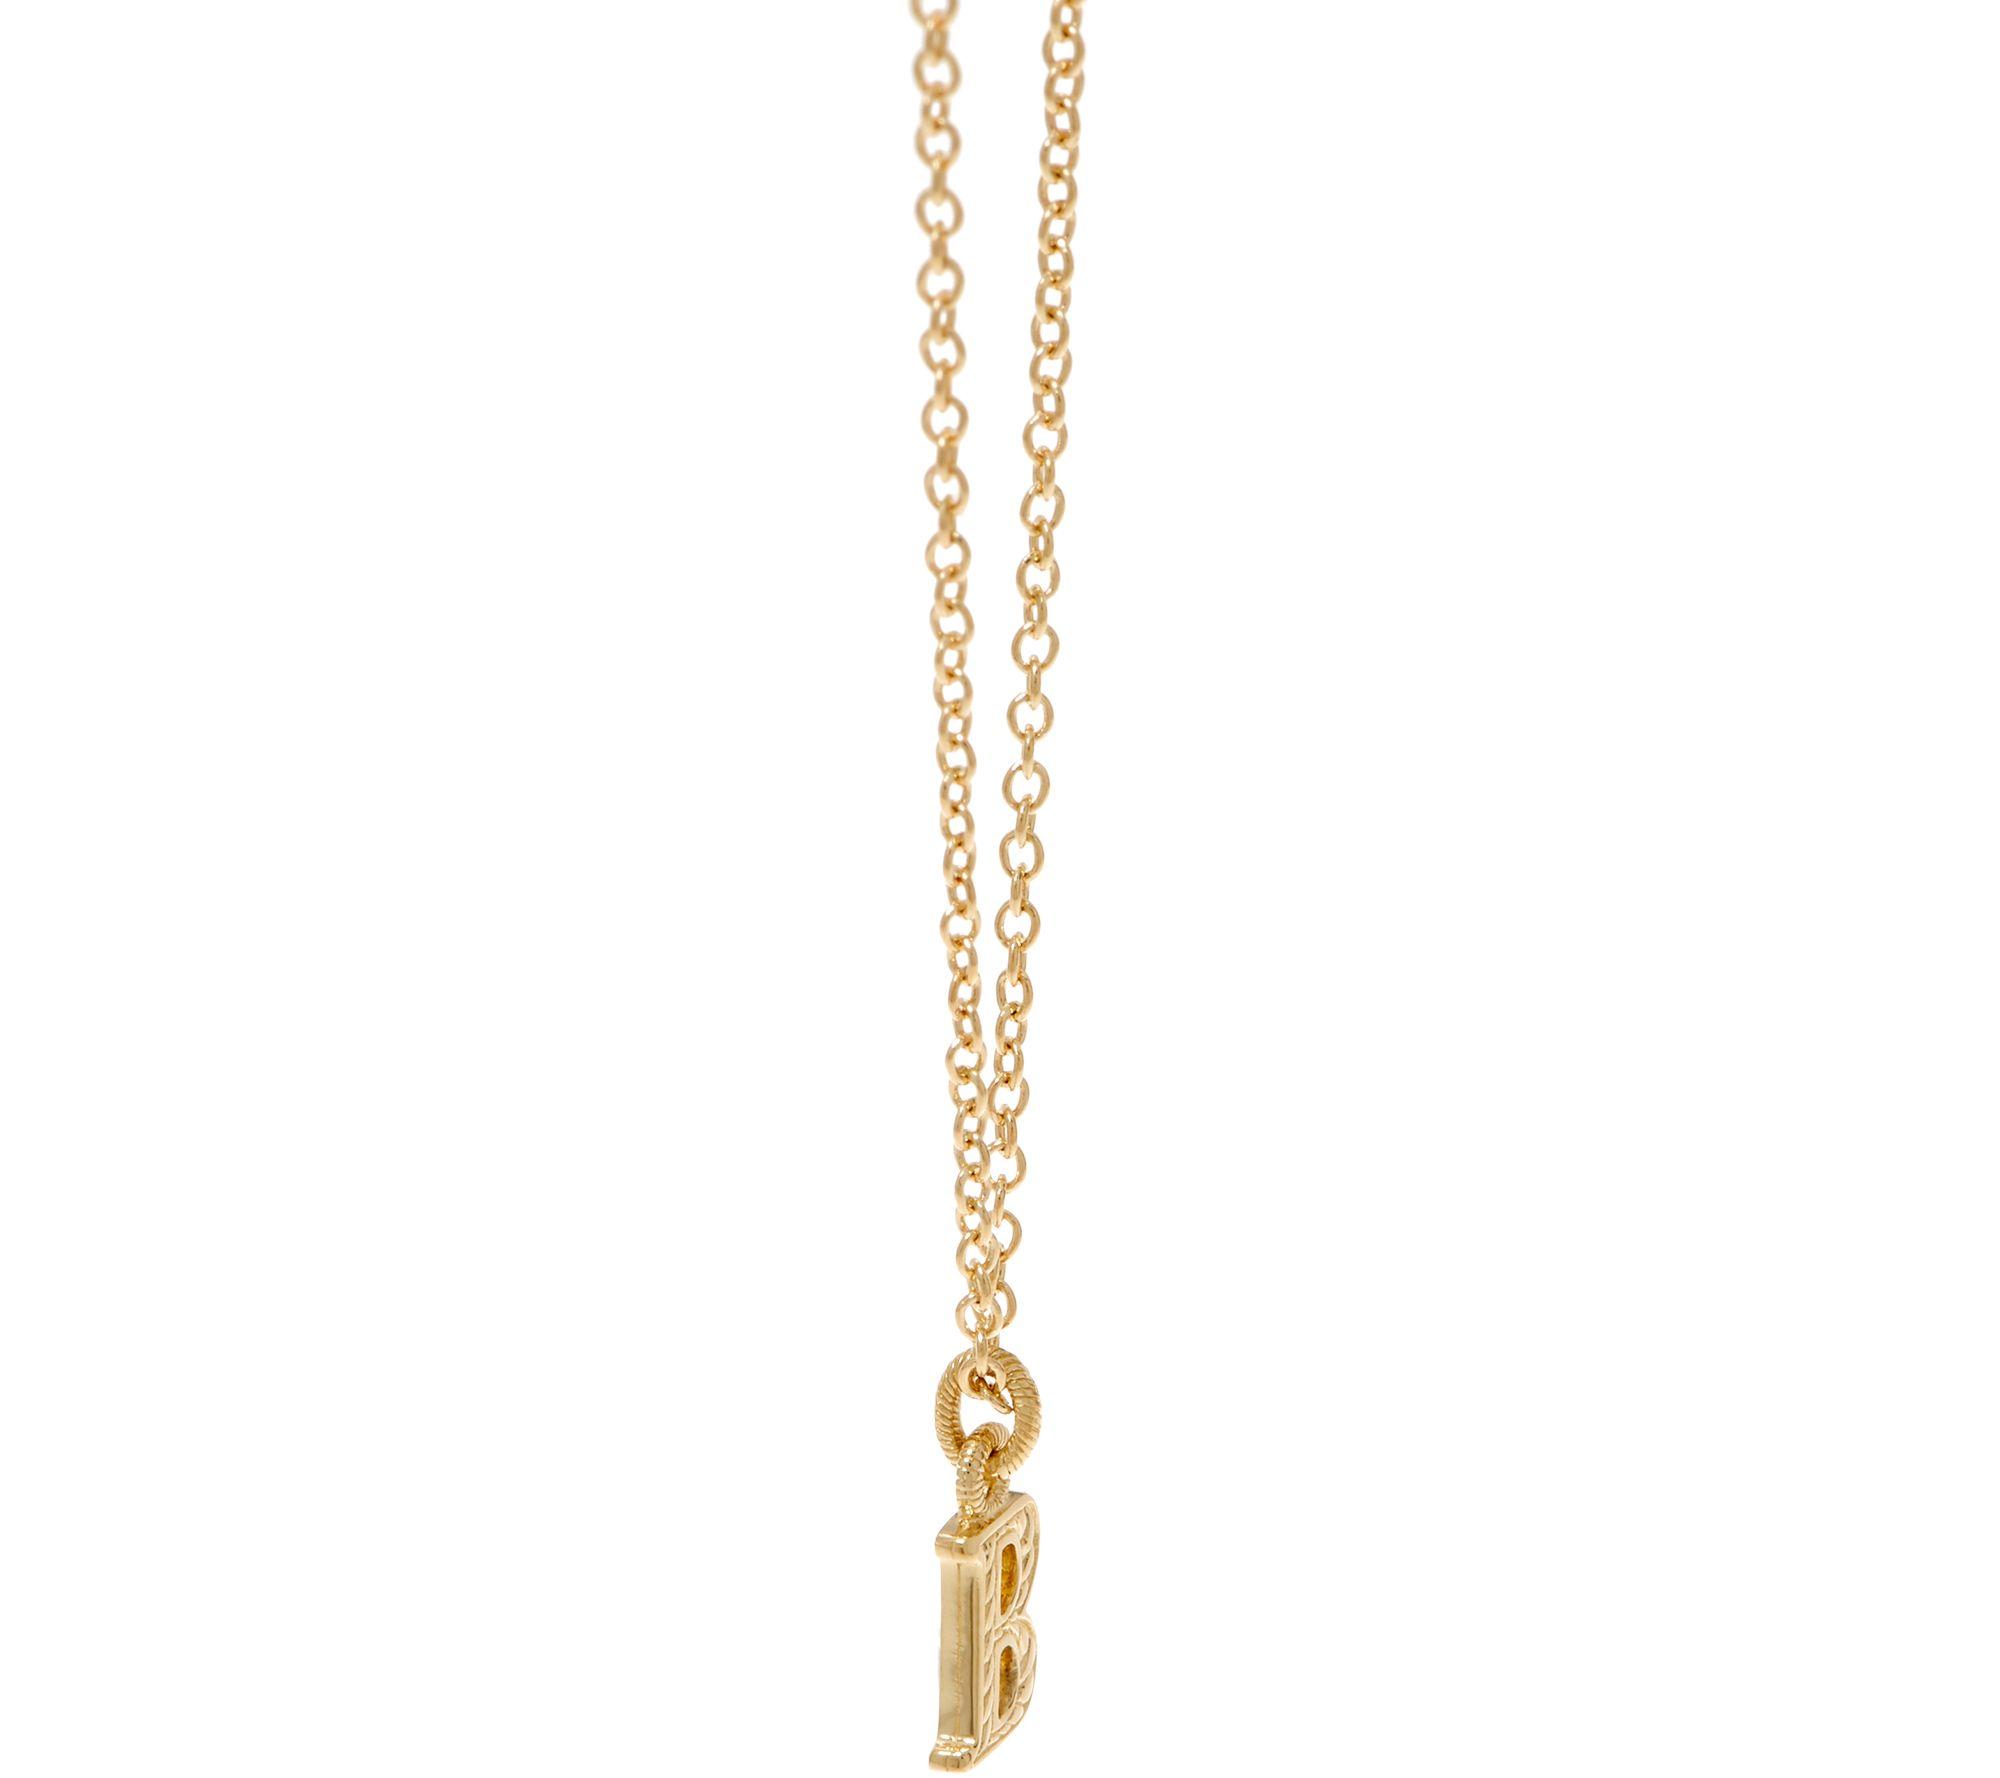 5faf6ffab0bf9 Judith Ripka 14K Gold Initial Necklace — QVC.com